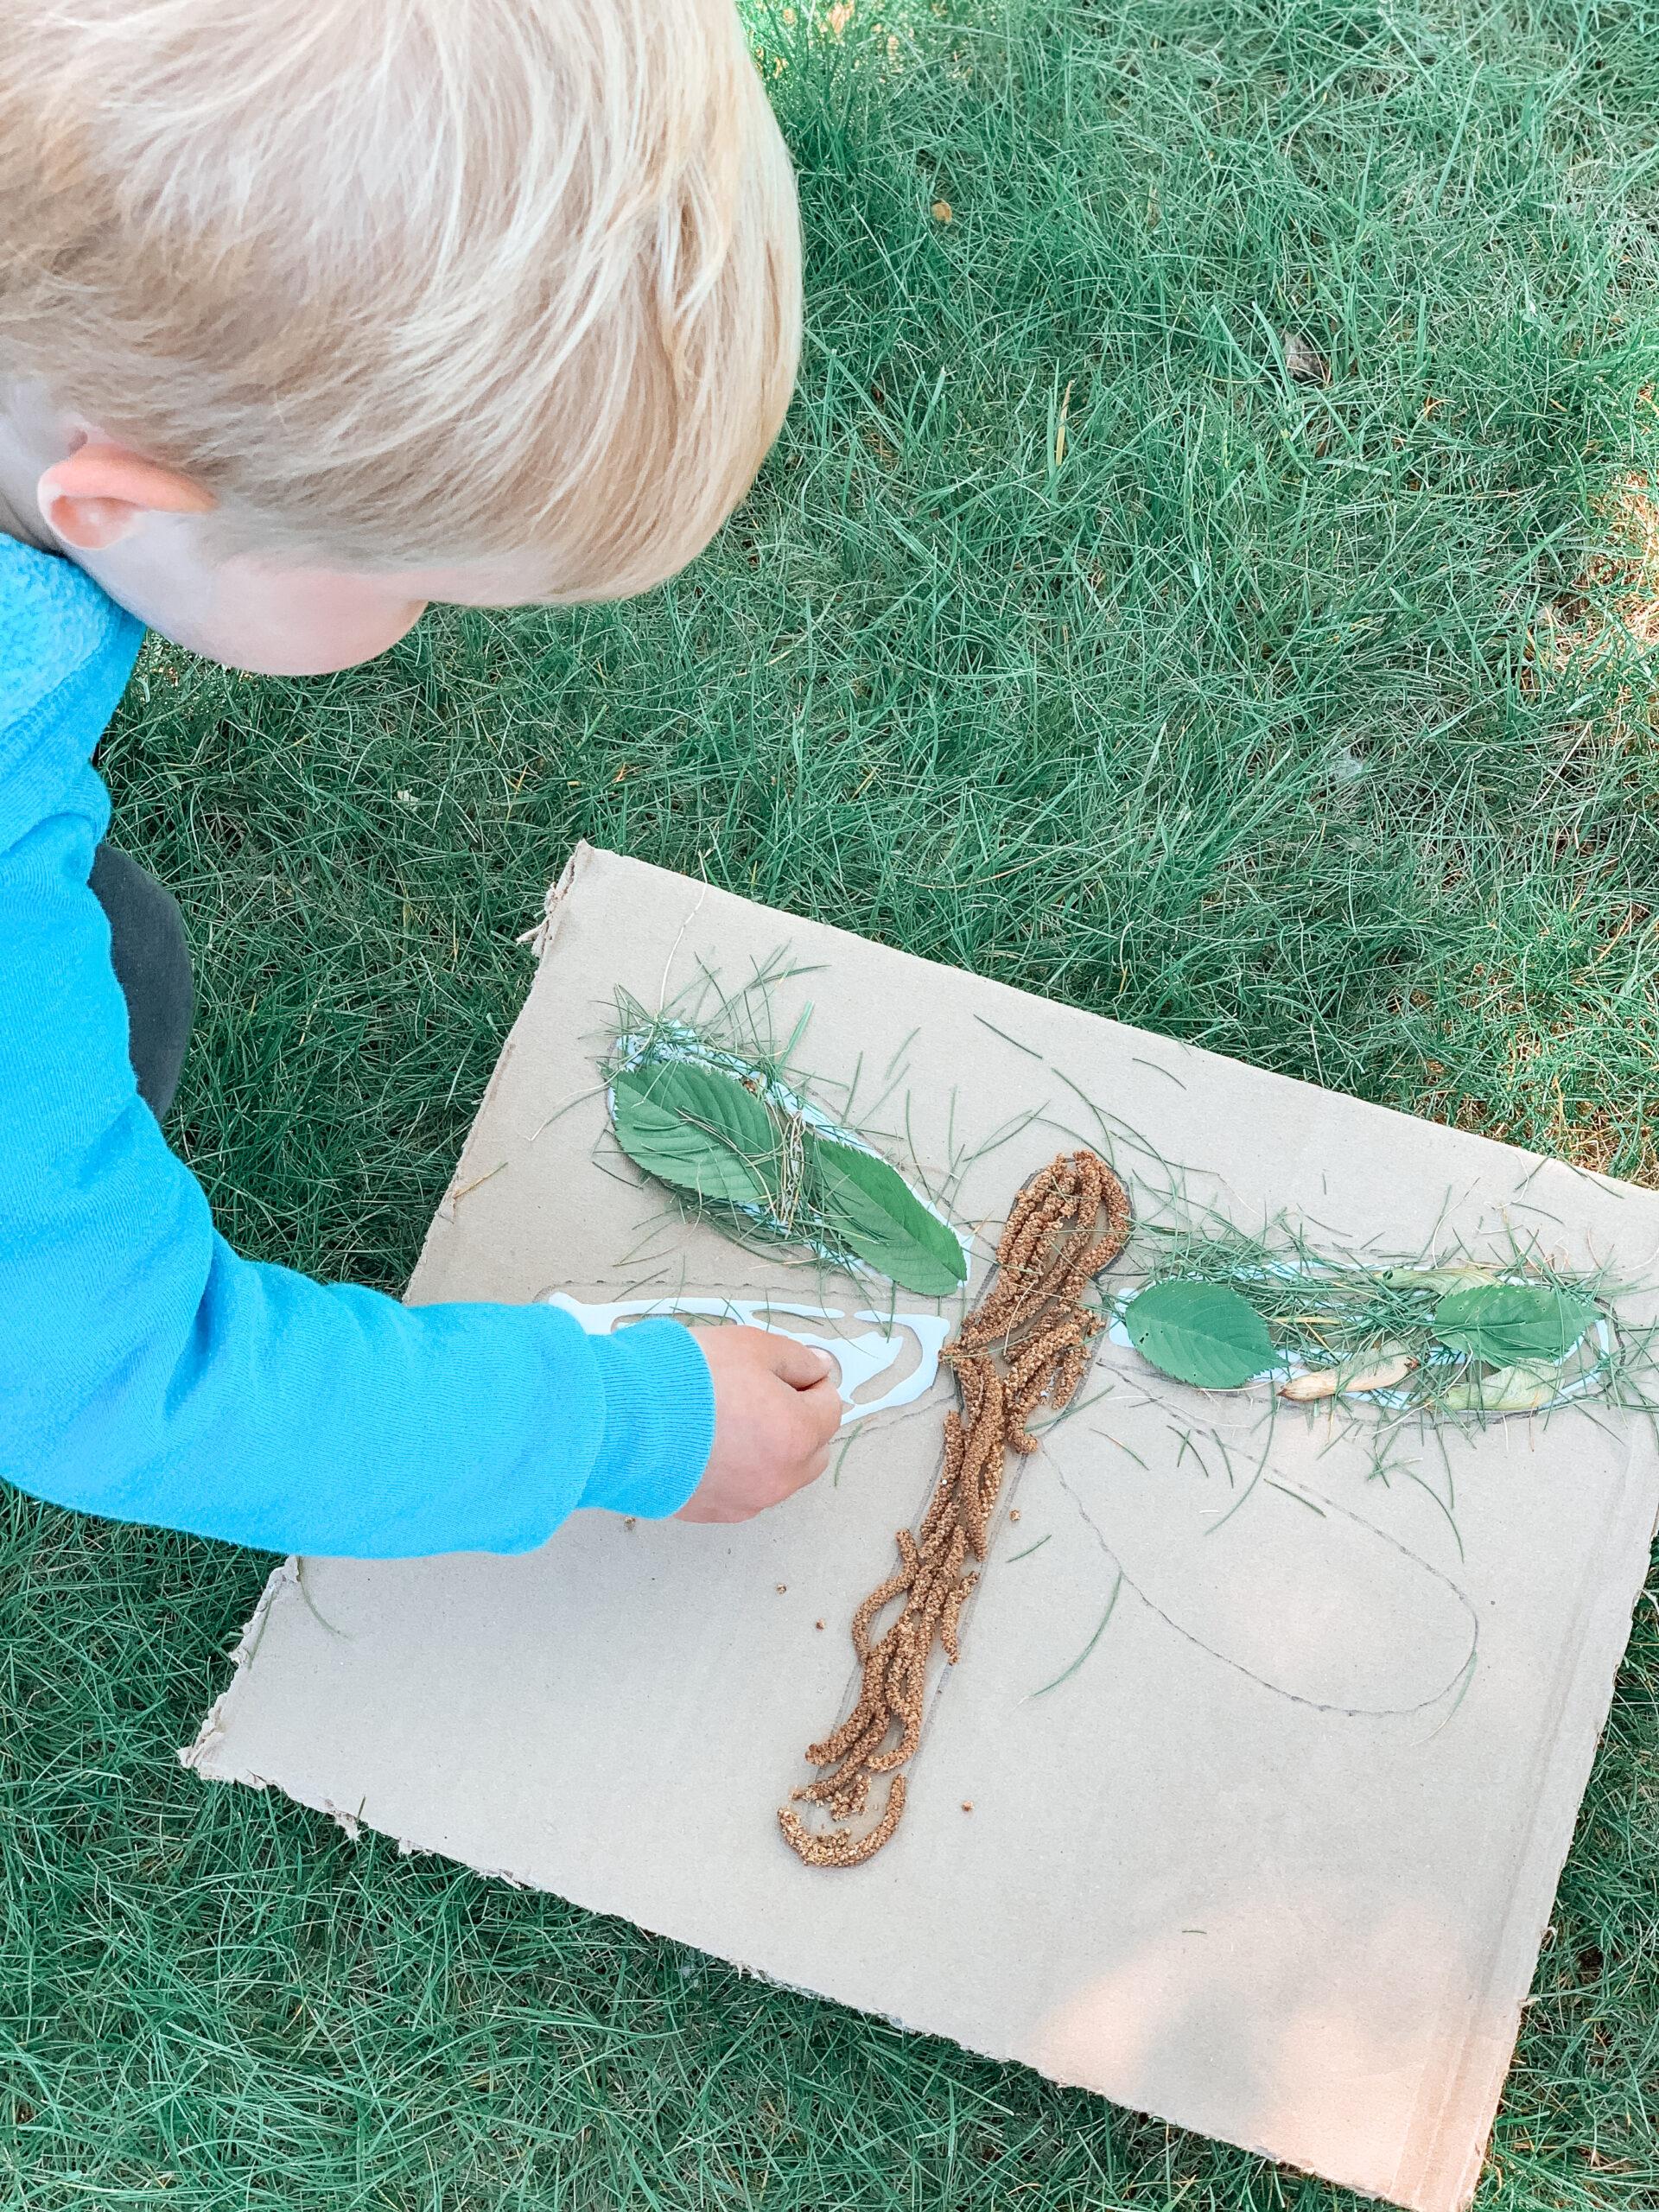 kids creating art with nature and repurposed cardboard